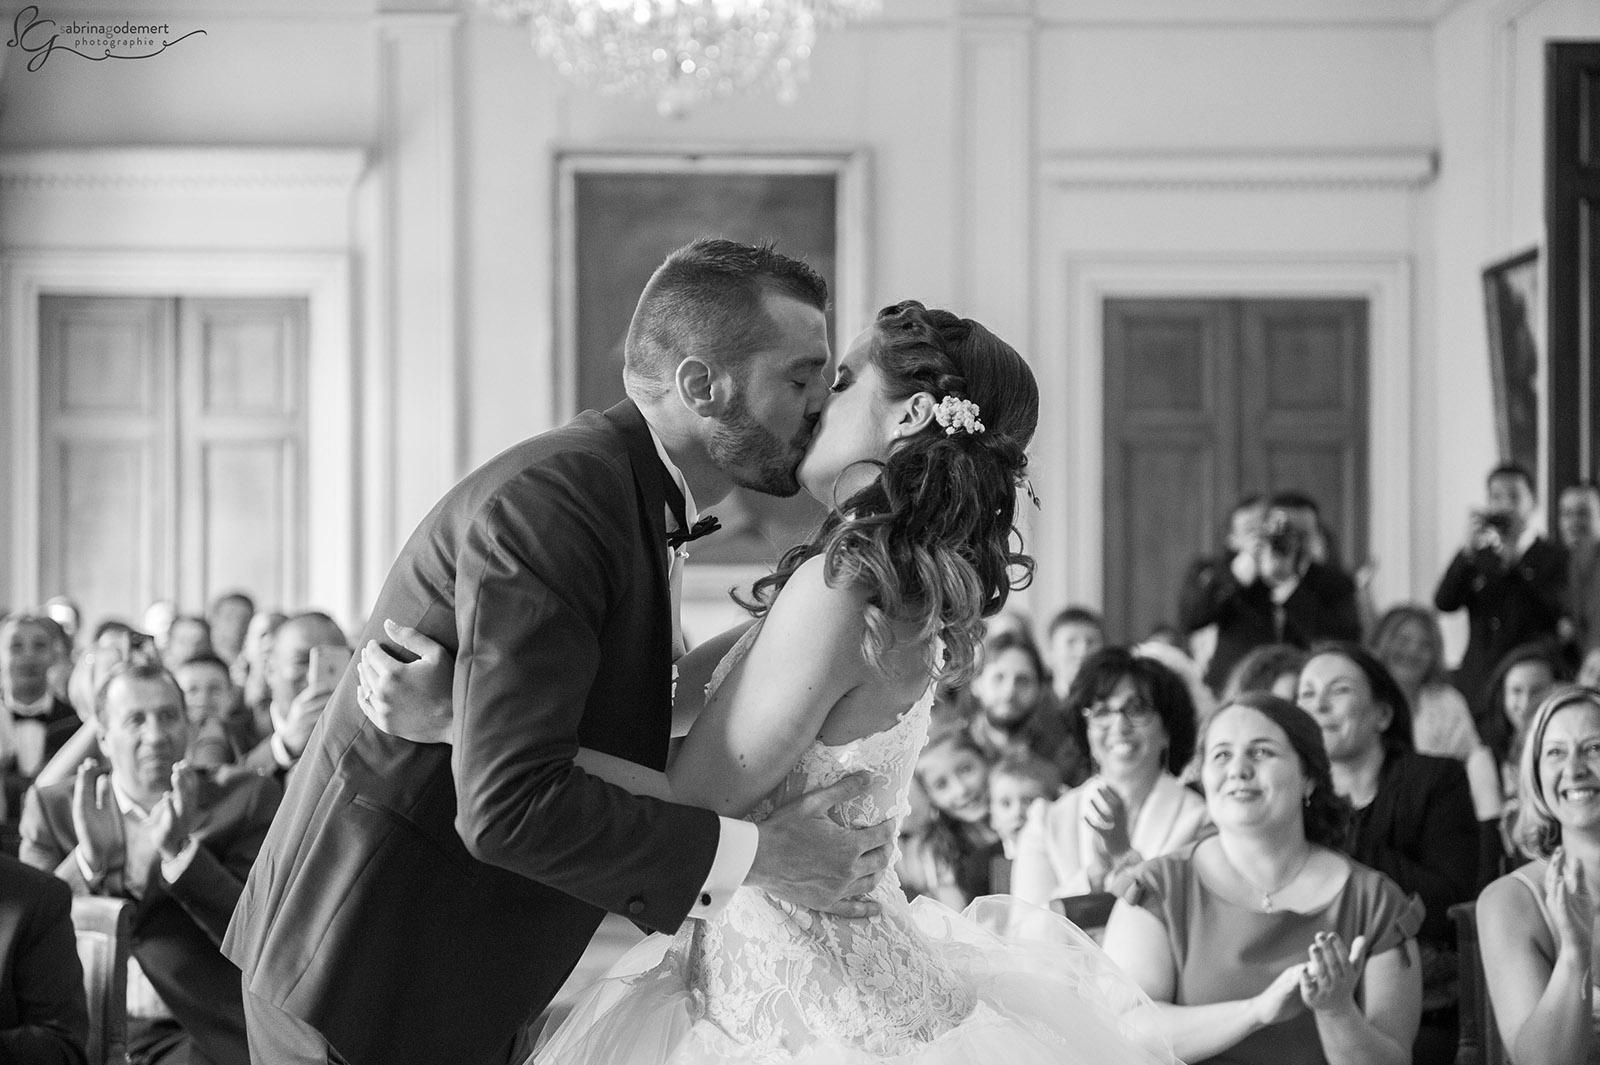 Mariage Soraya et Julien - Sabrina Godemert photographe-126